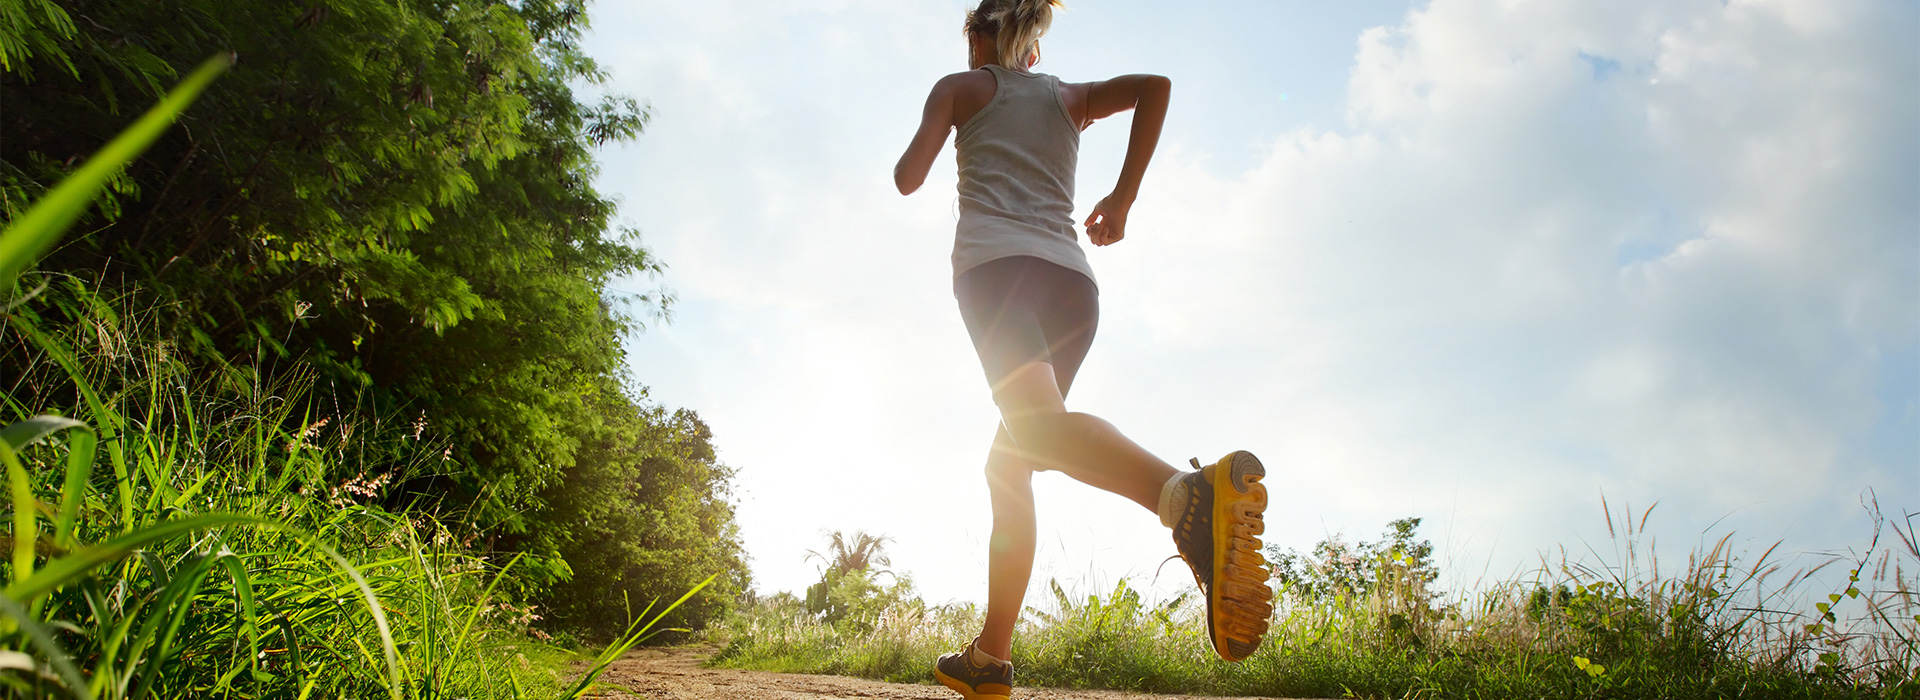 sistime-meia-maratona-das-estradas-2016-capa